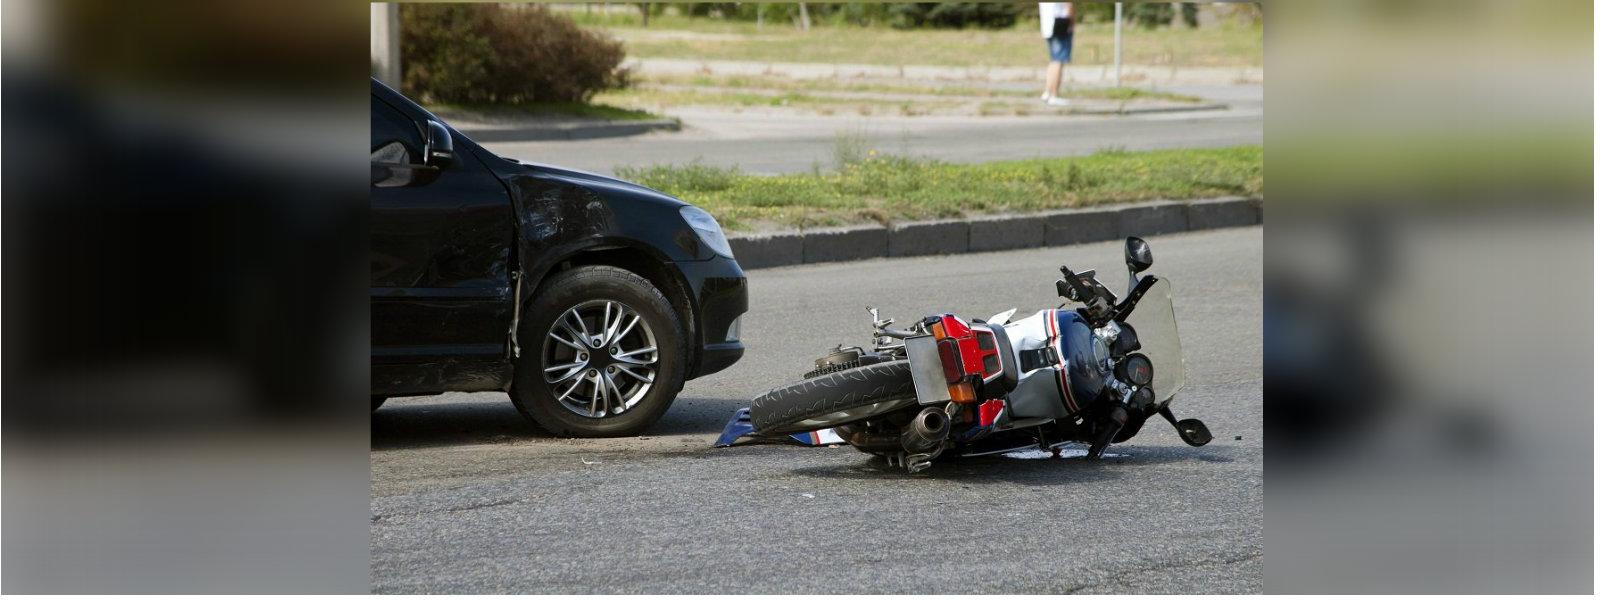 Kurunegala – Settikulam road accidents : 2 dead, 4 injured